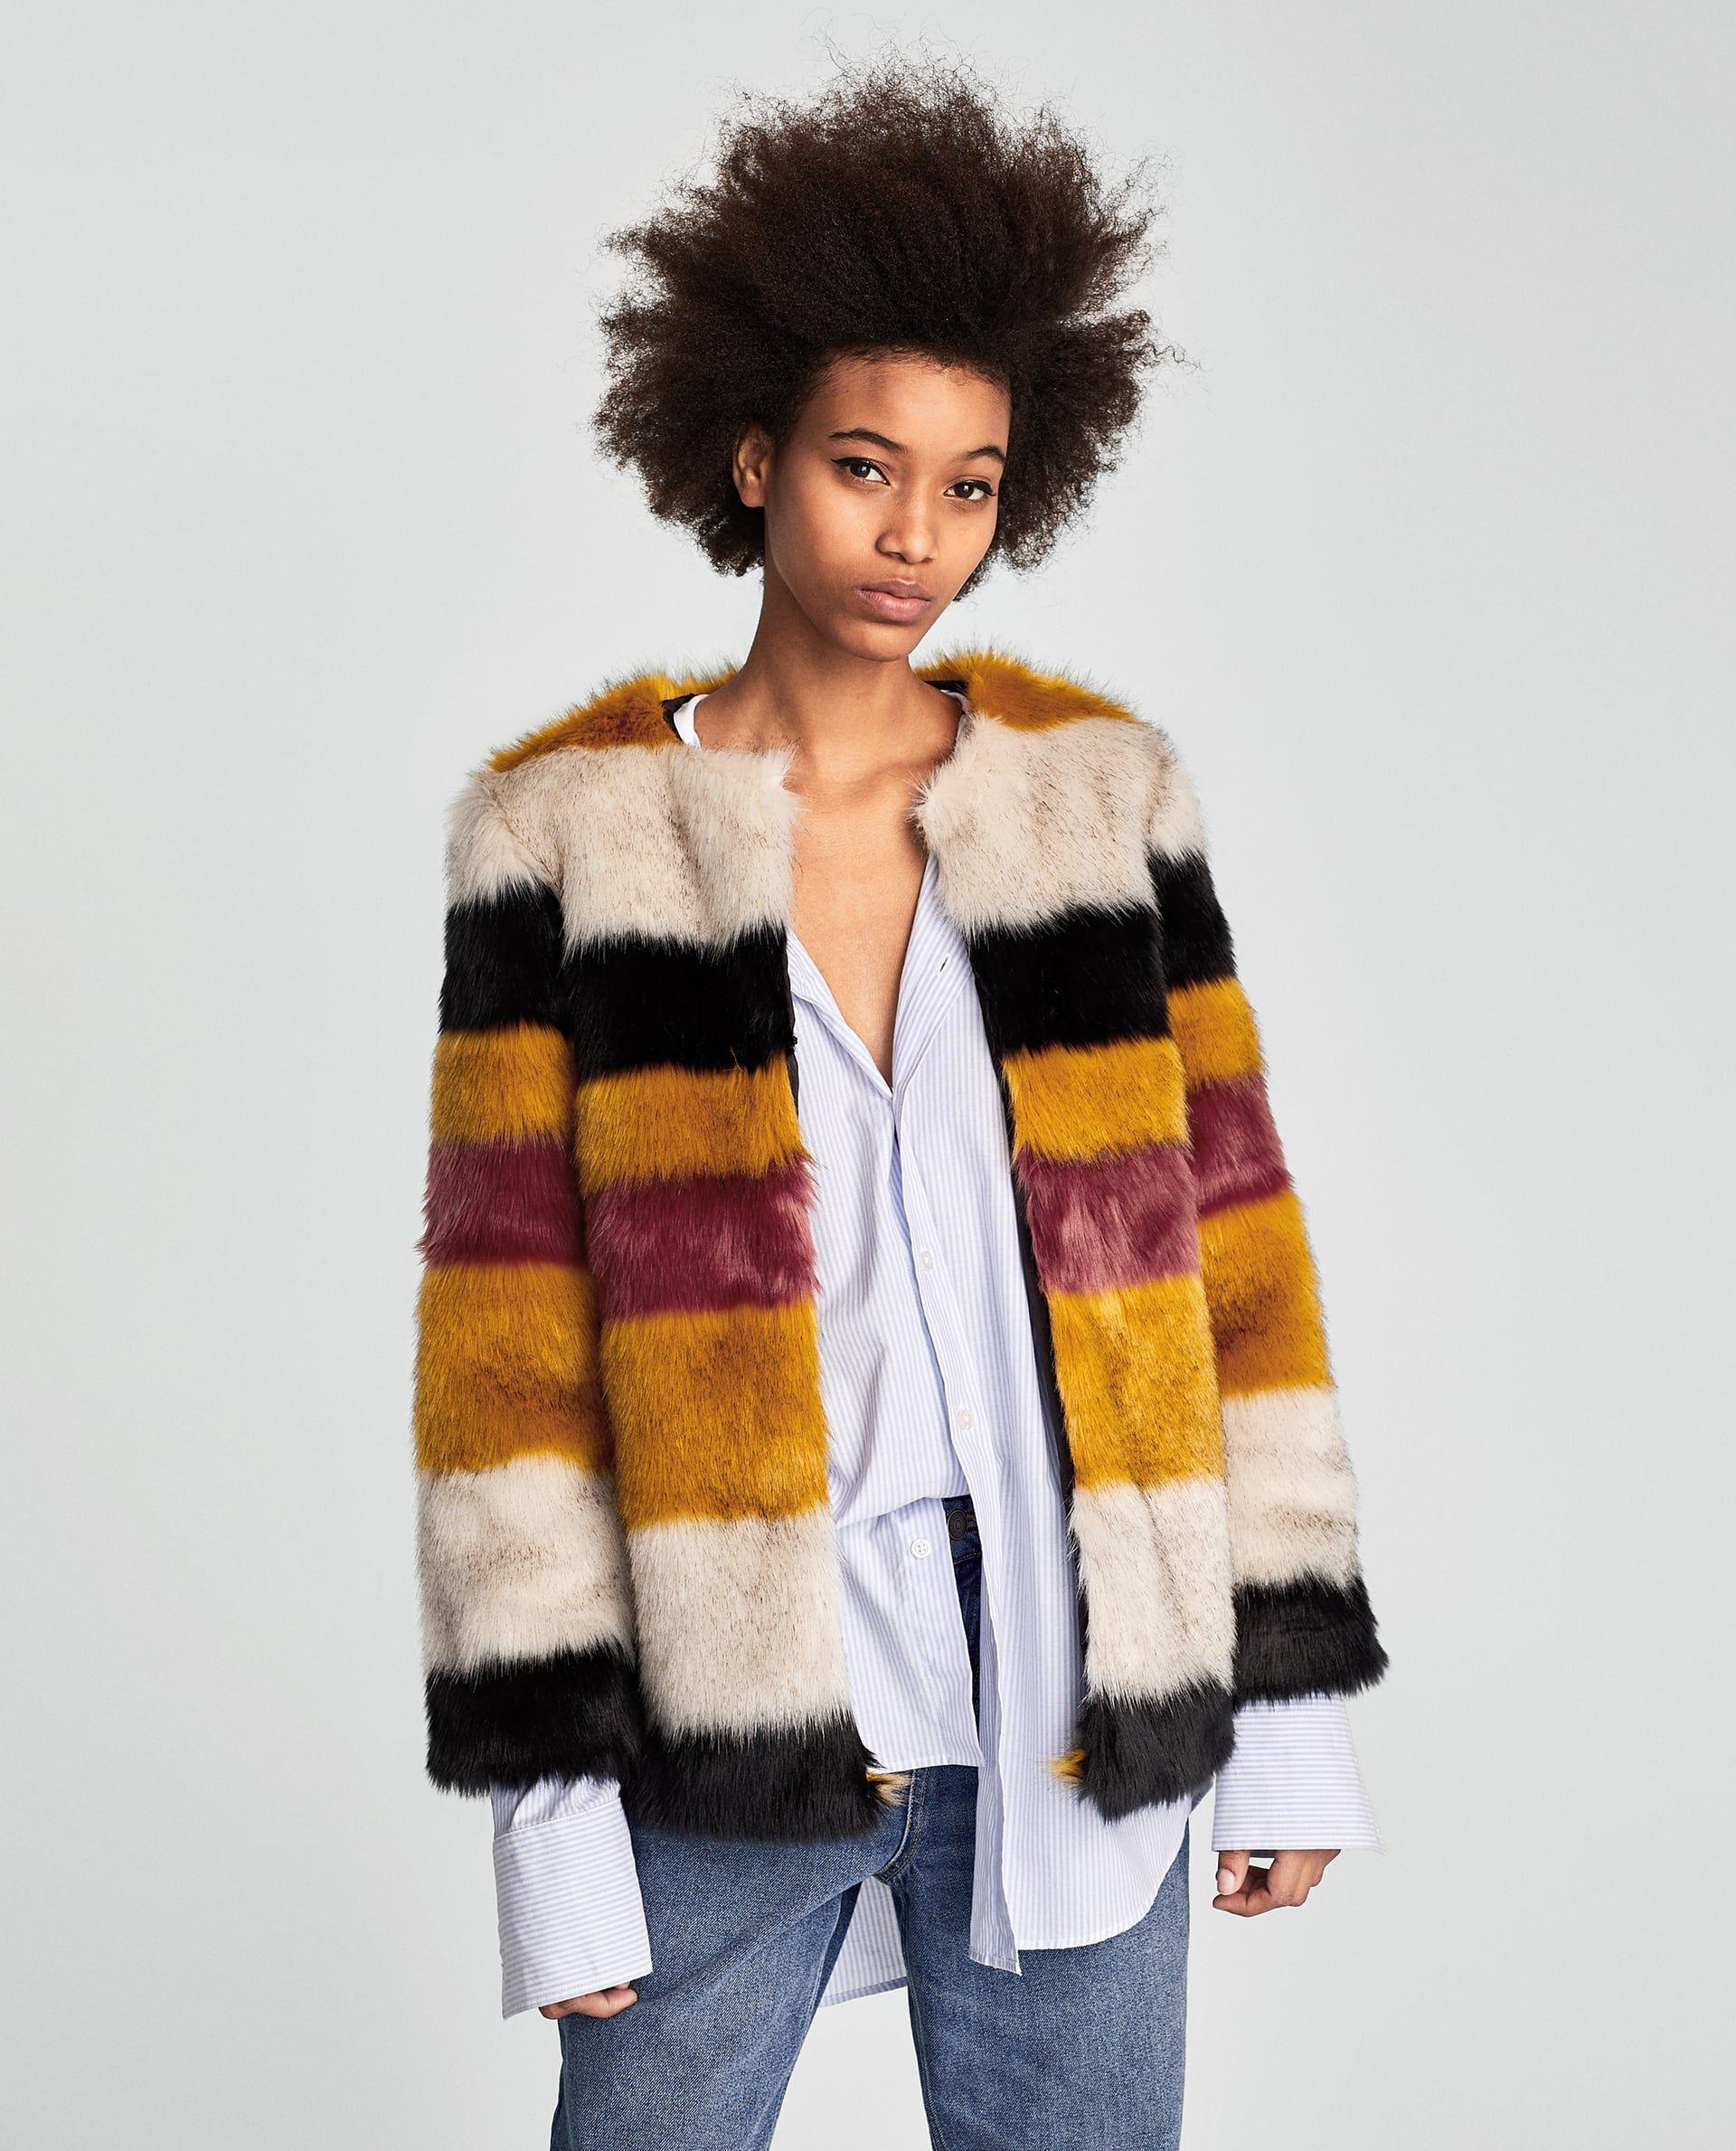 Studded faux leather skirt Stripes fashion, Fur jacket